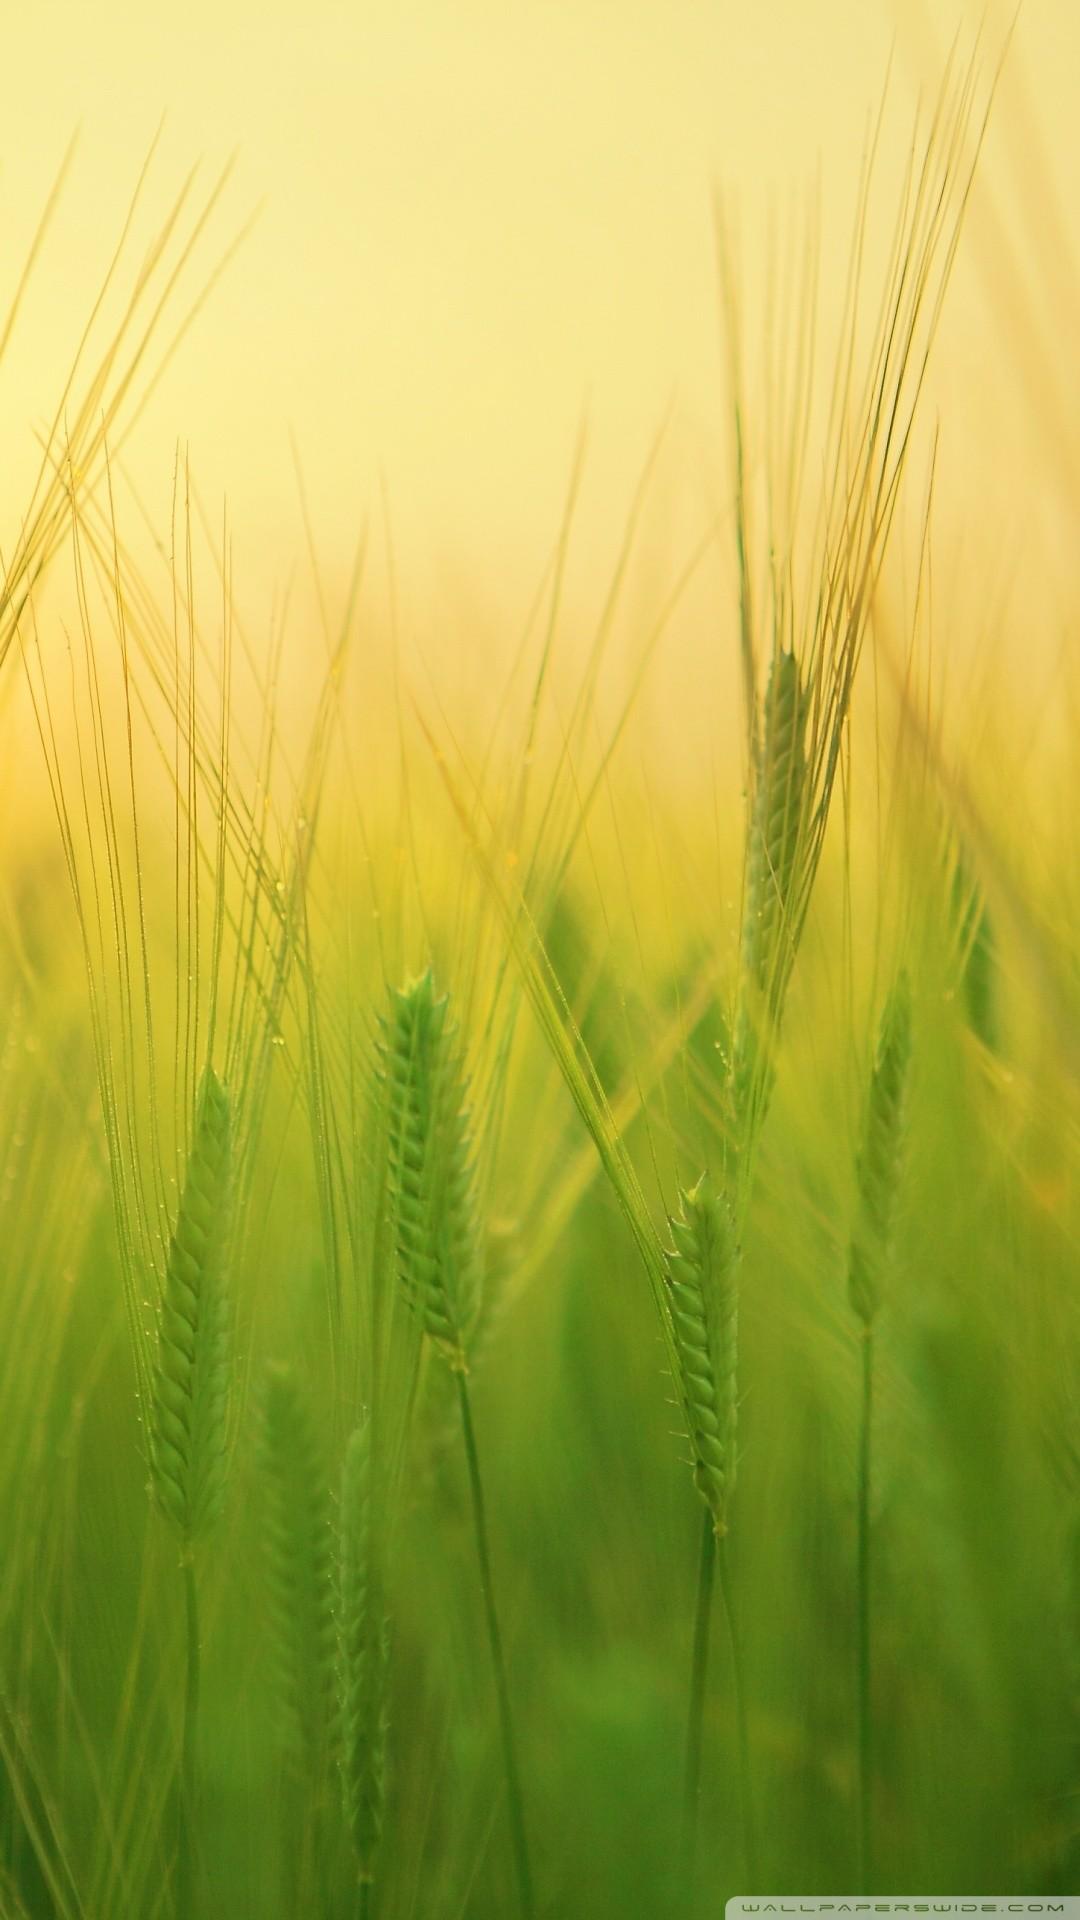 Free Green Barley Field phone wallpaper by oba10